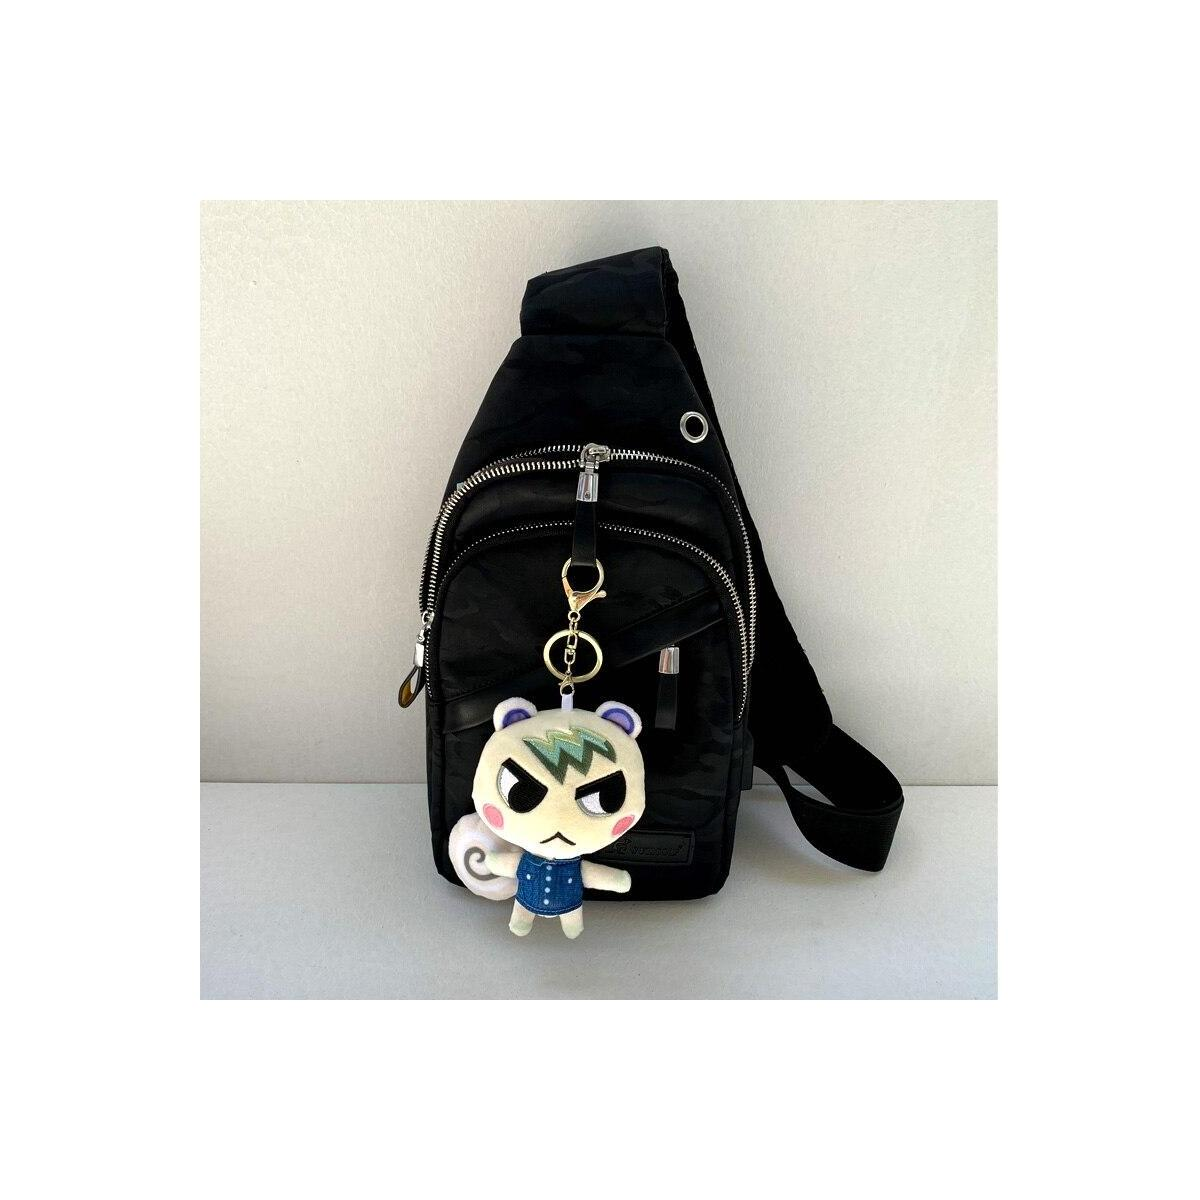 Animal Crossing Plush Villager Keychains, 12cm-bunnie